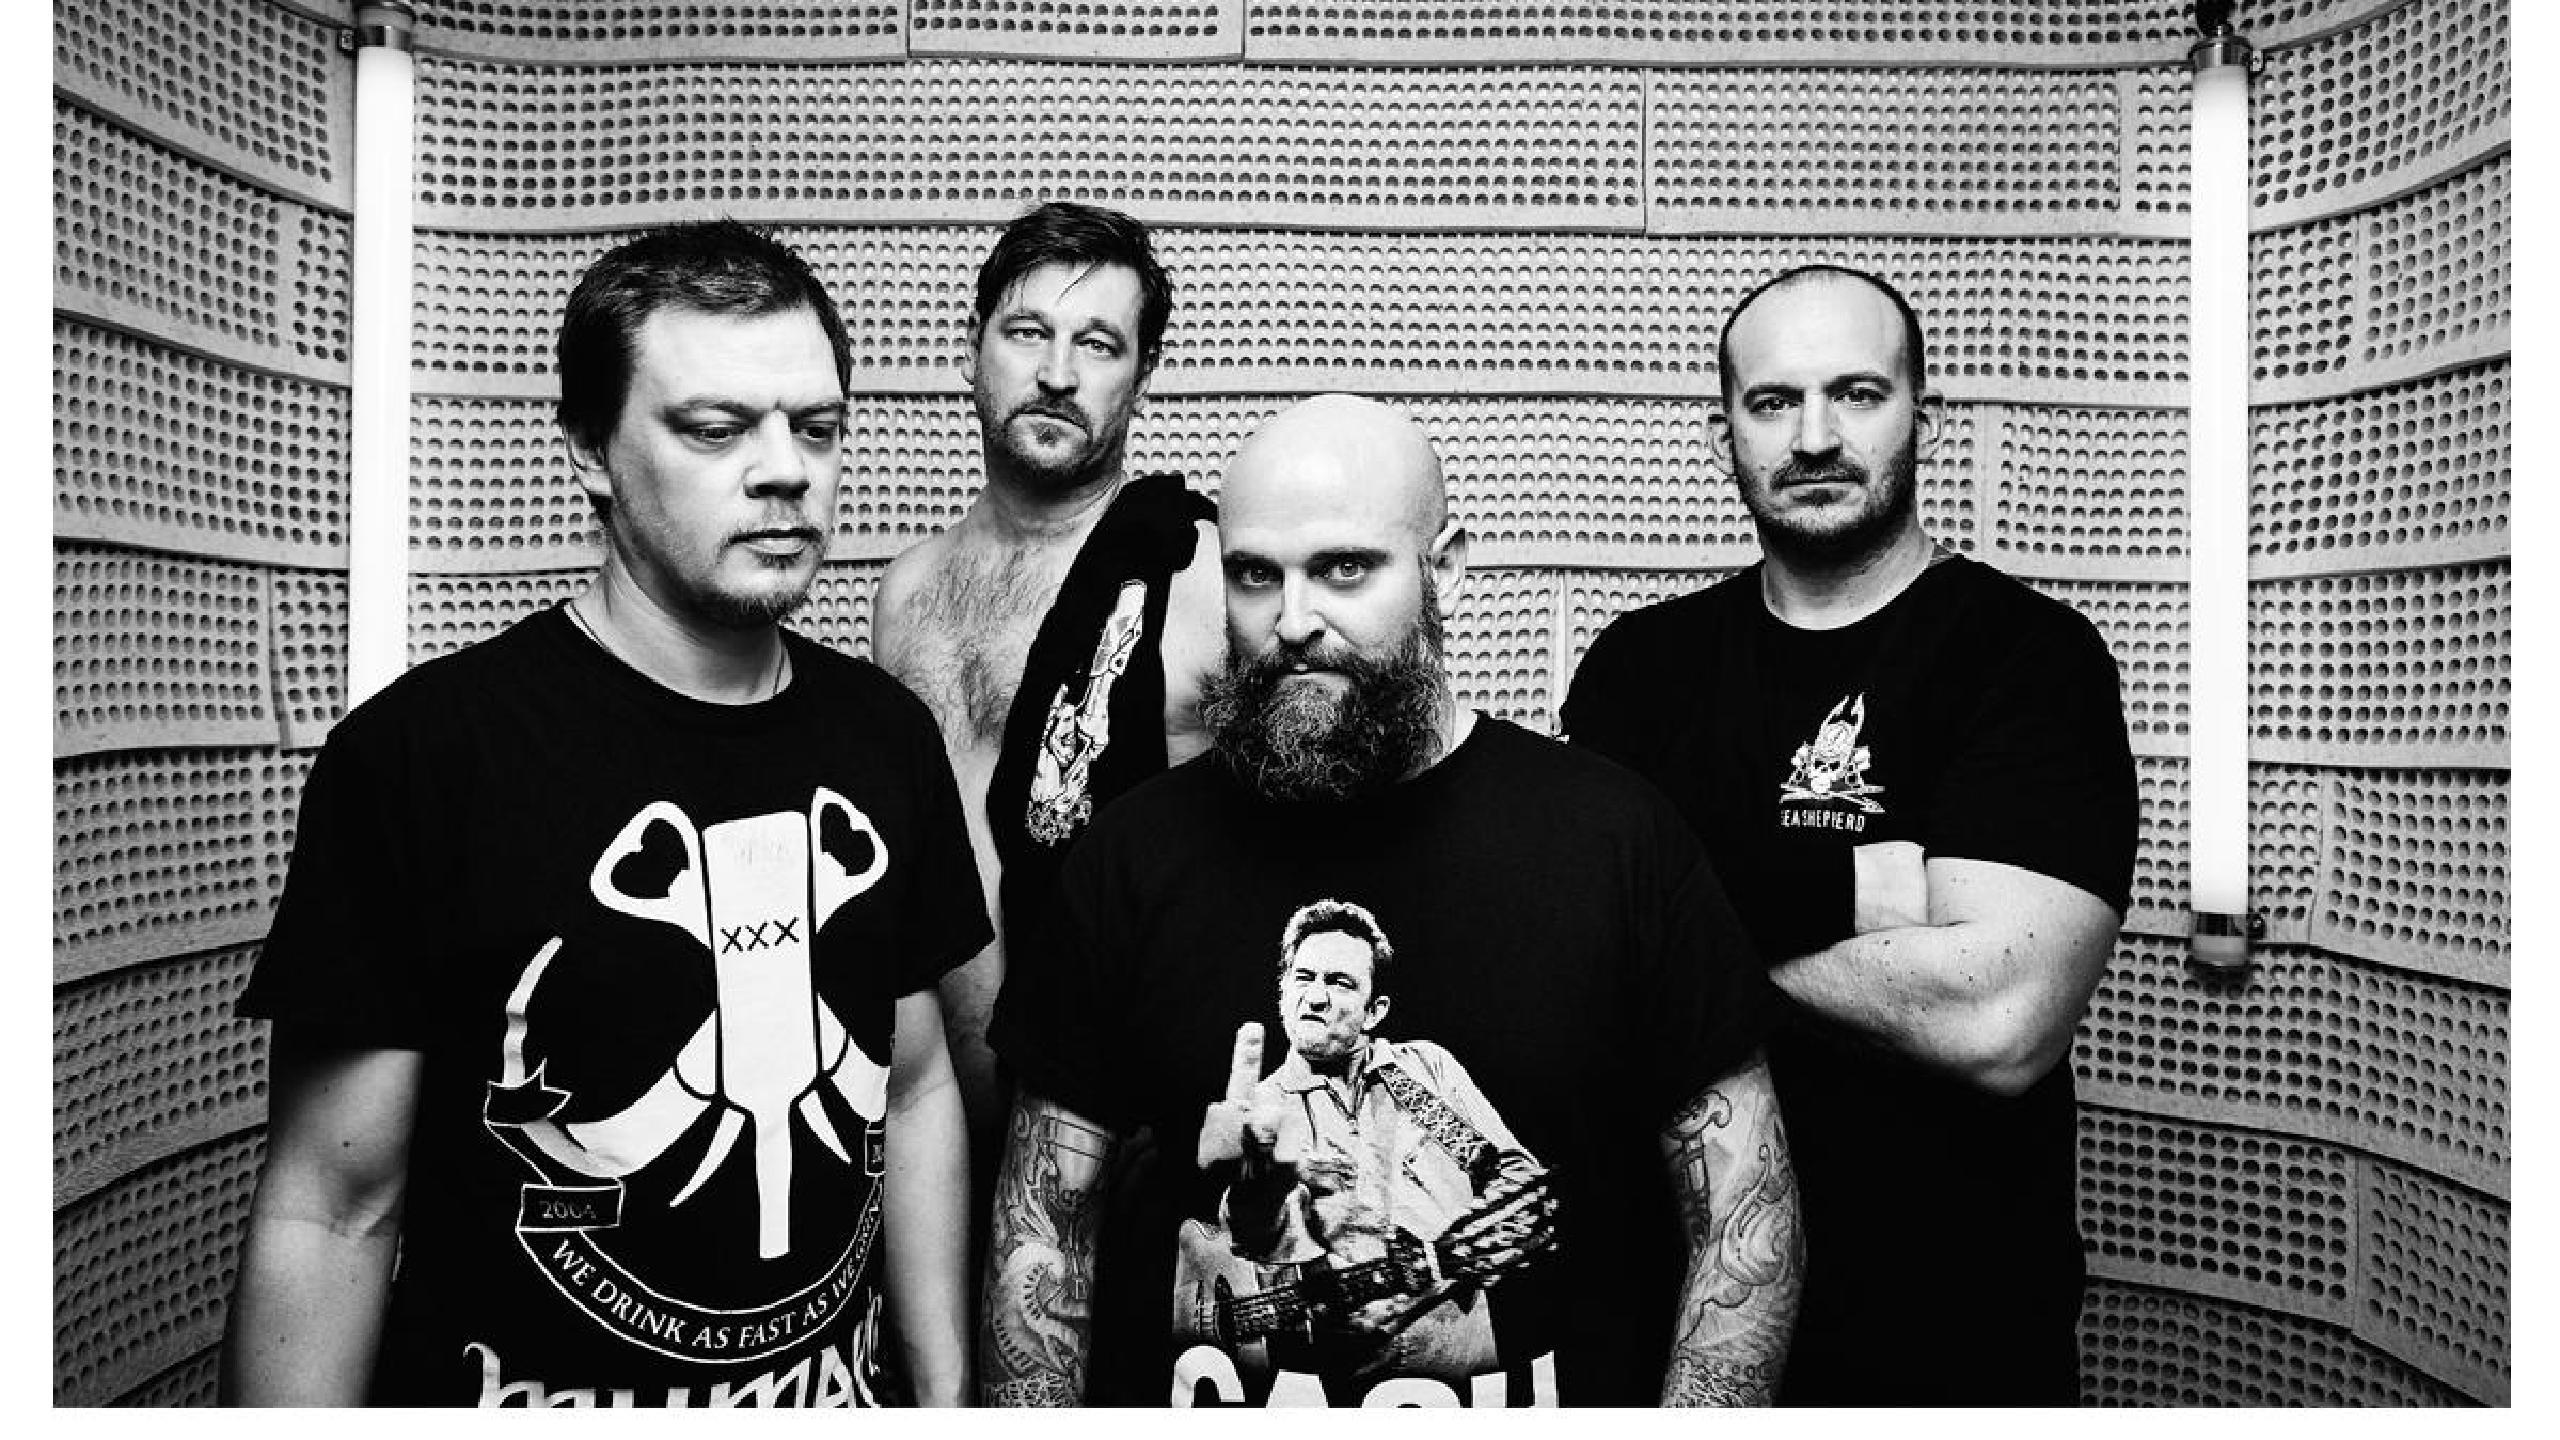 瑞士極端金屬 Nostromo 新曲釋出 Superbia